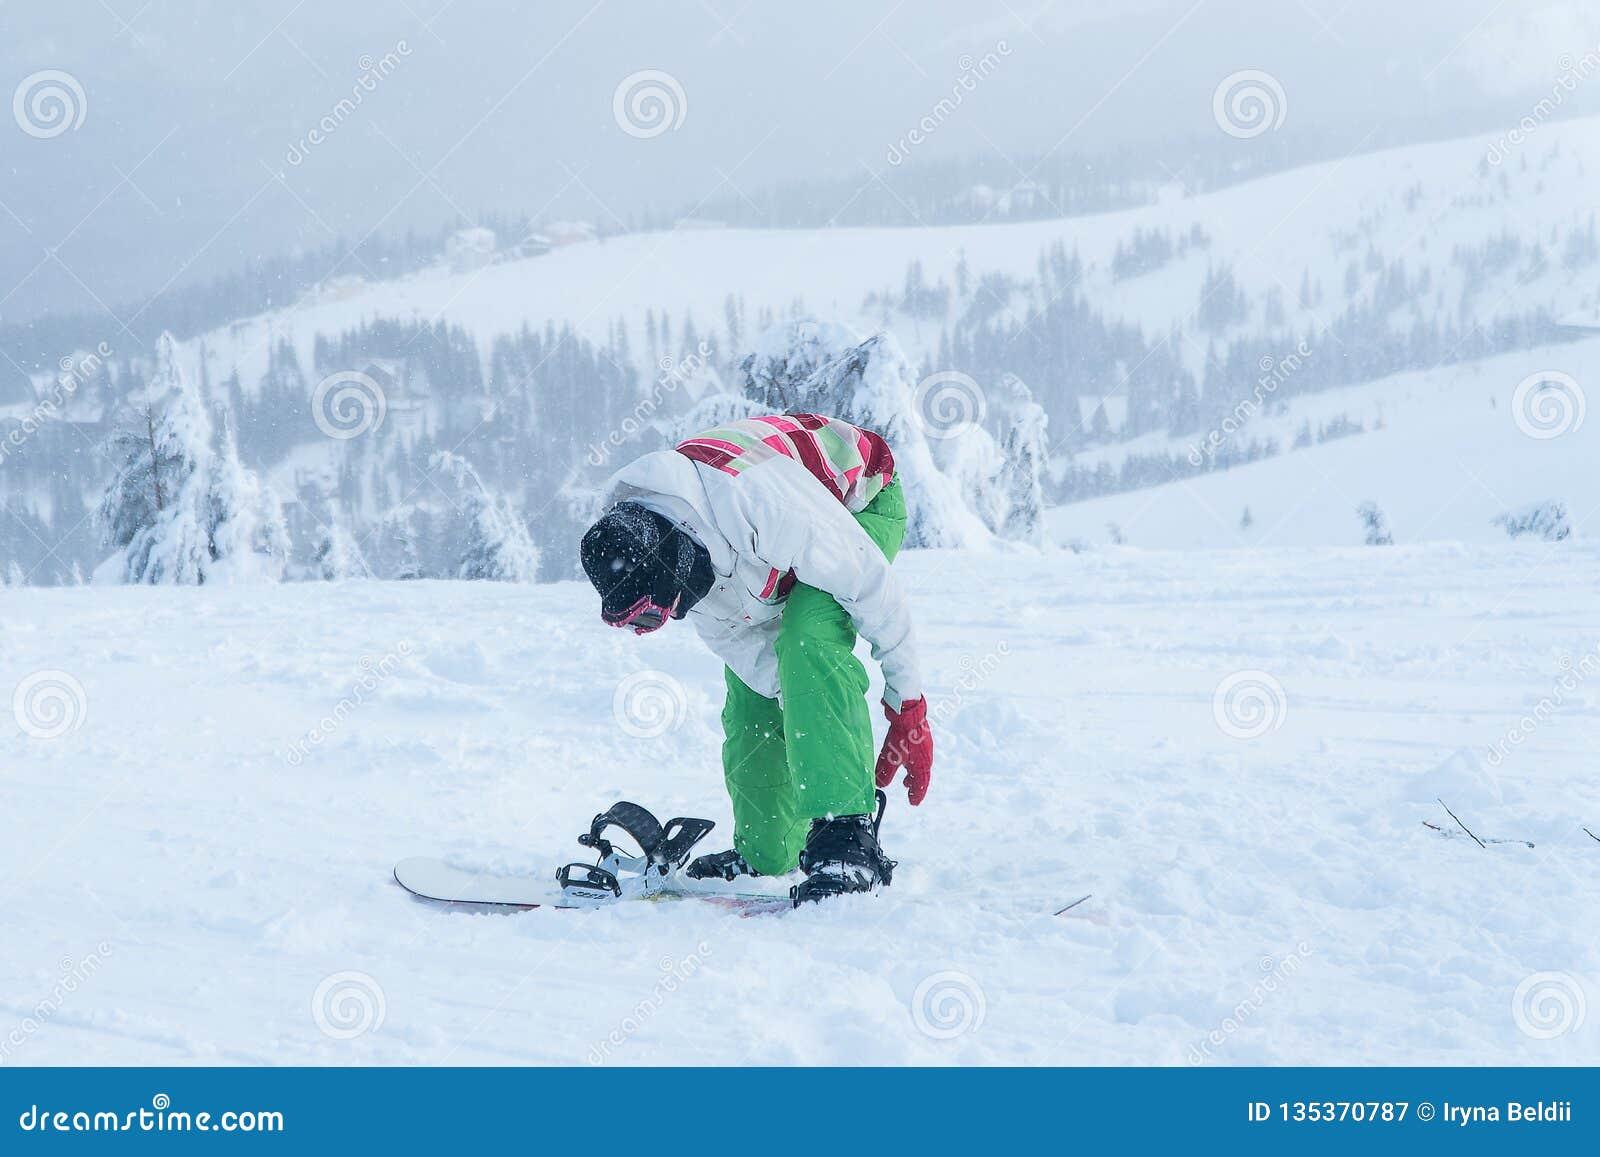 Woman Snowboard Snowboarder Winter Snow Snowboard Stock